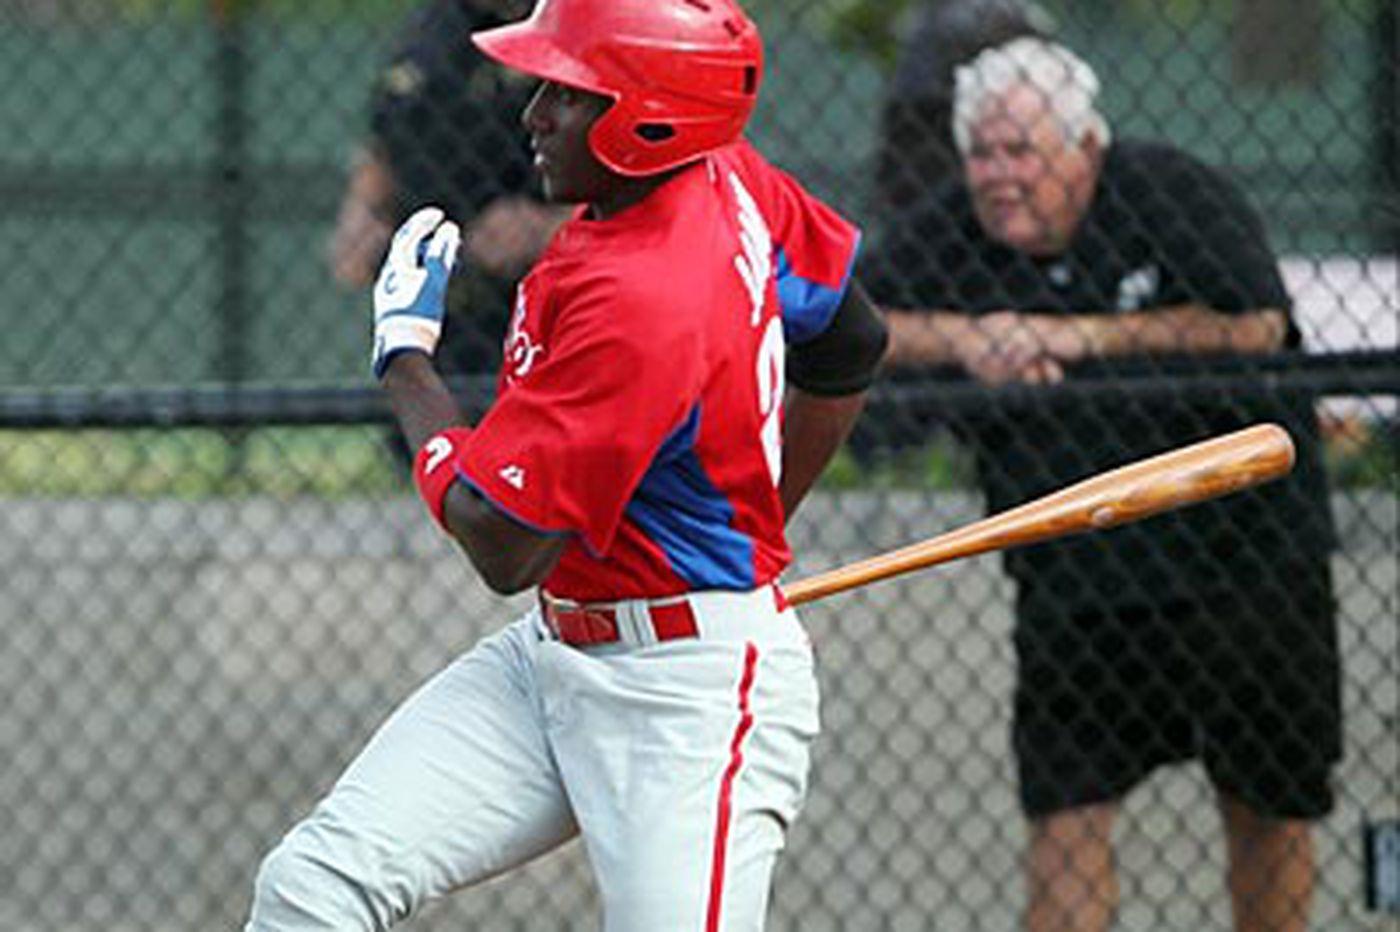 David Murphy: Jiwan James on a major tear in Phillies minors